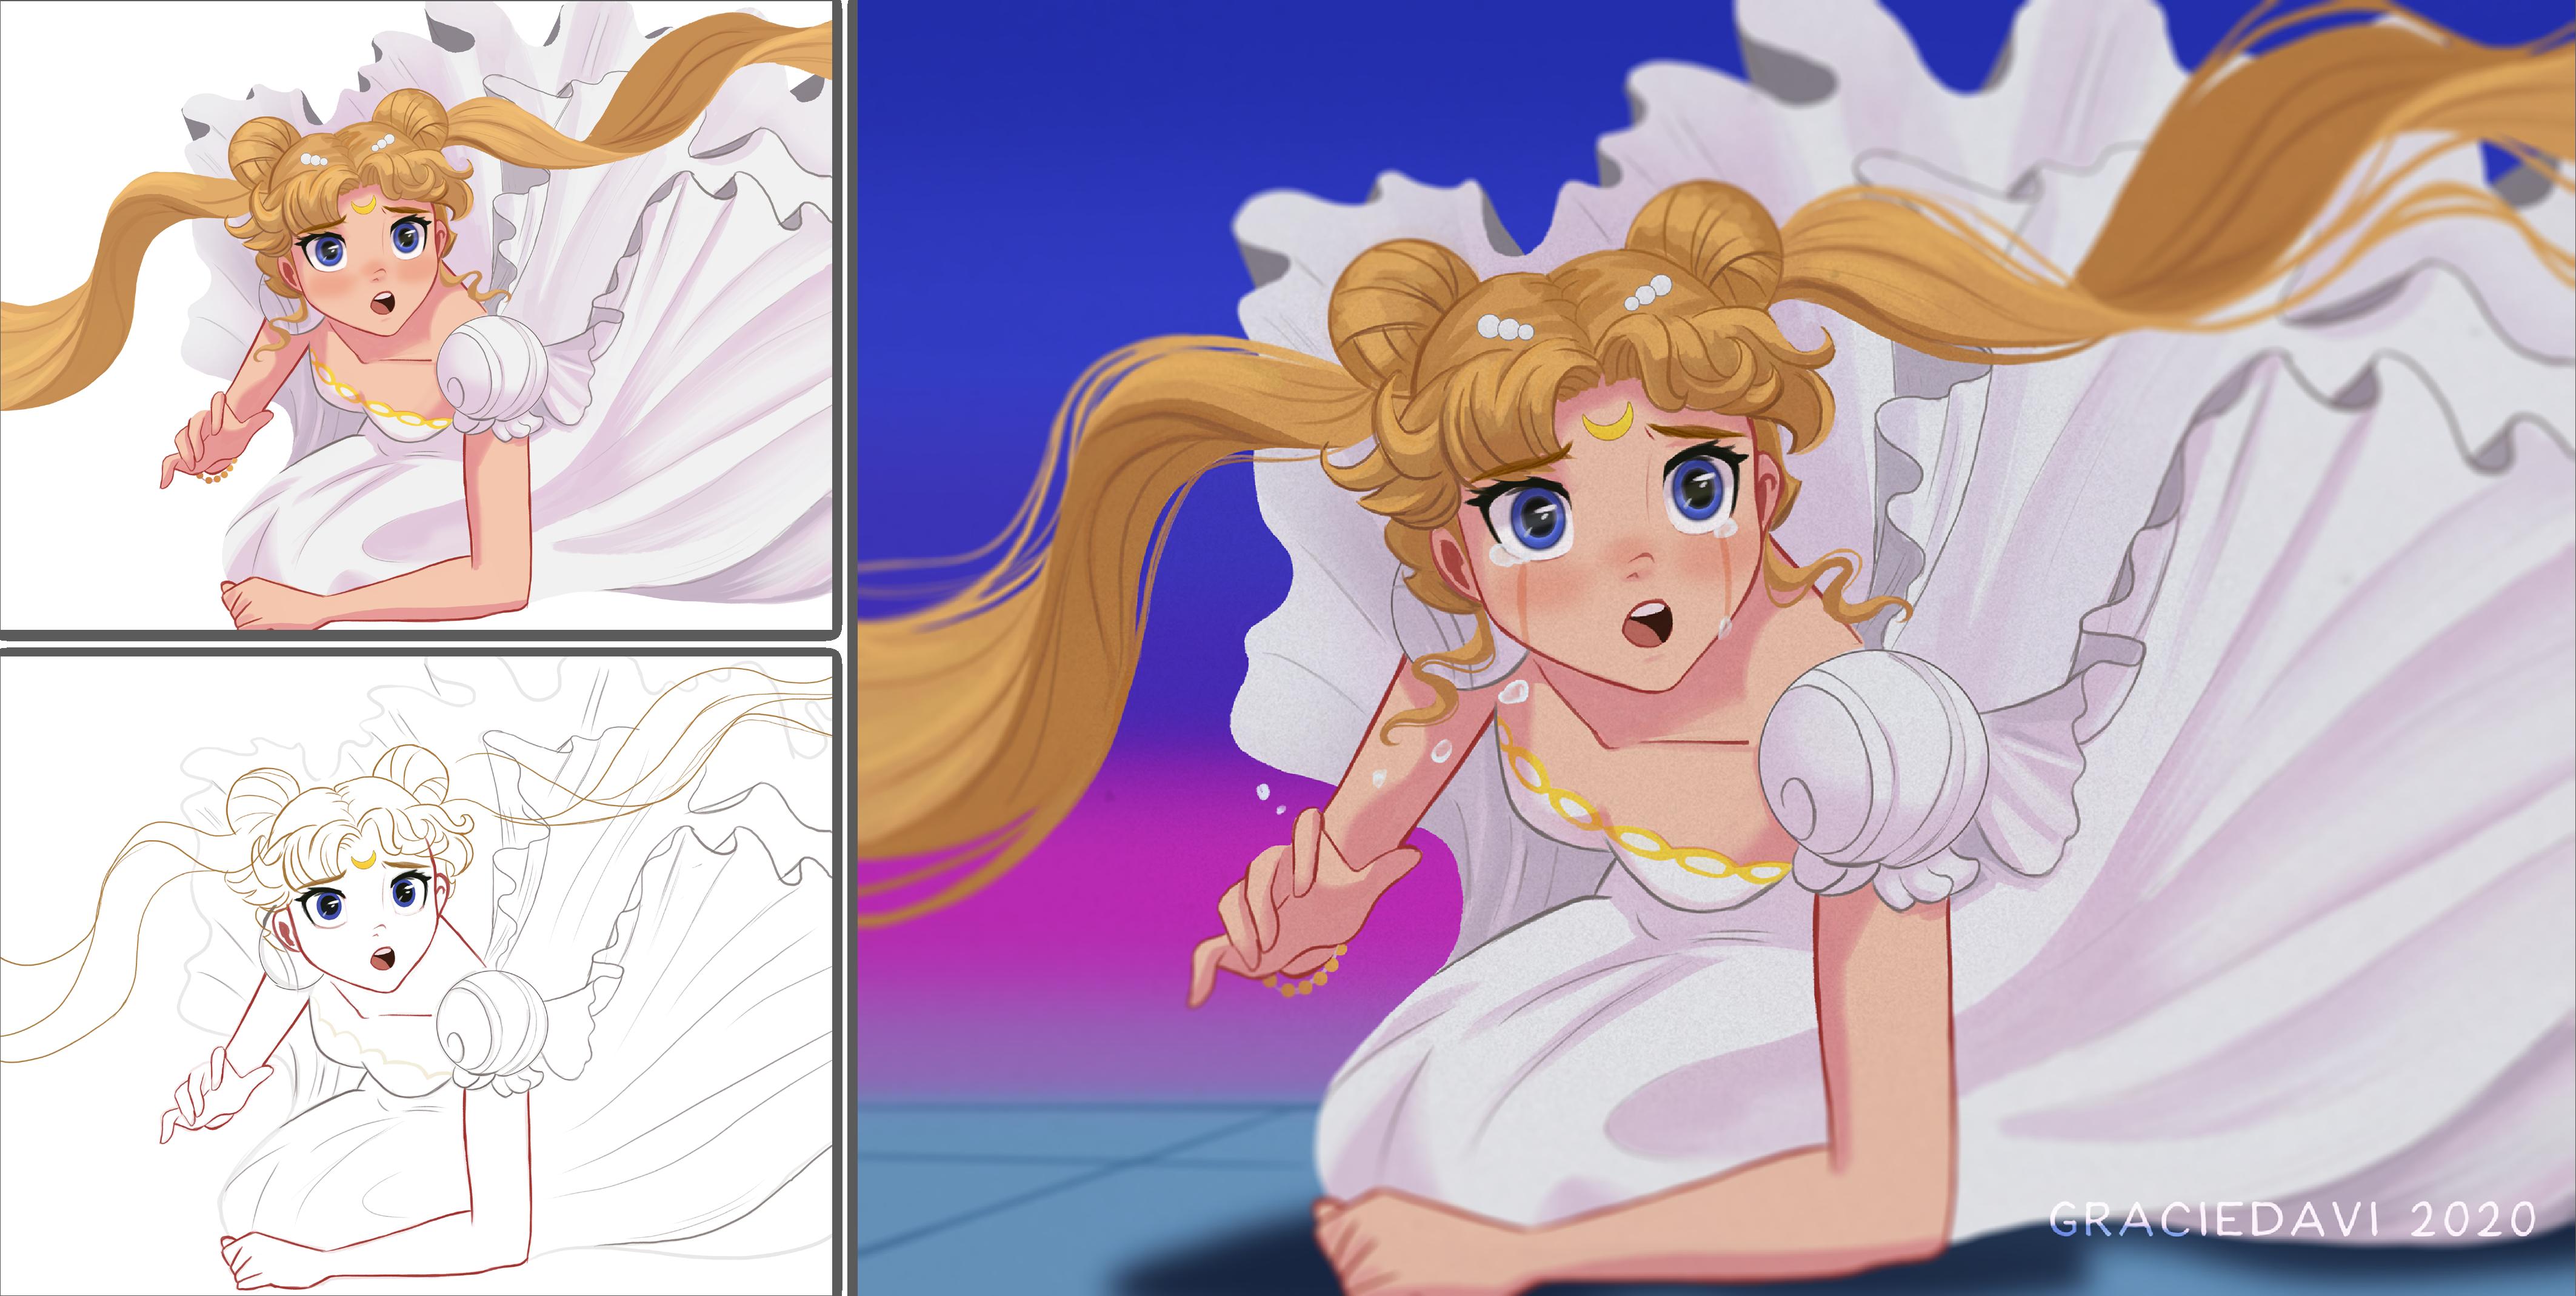 Sailor Moon Screencap Rework